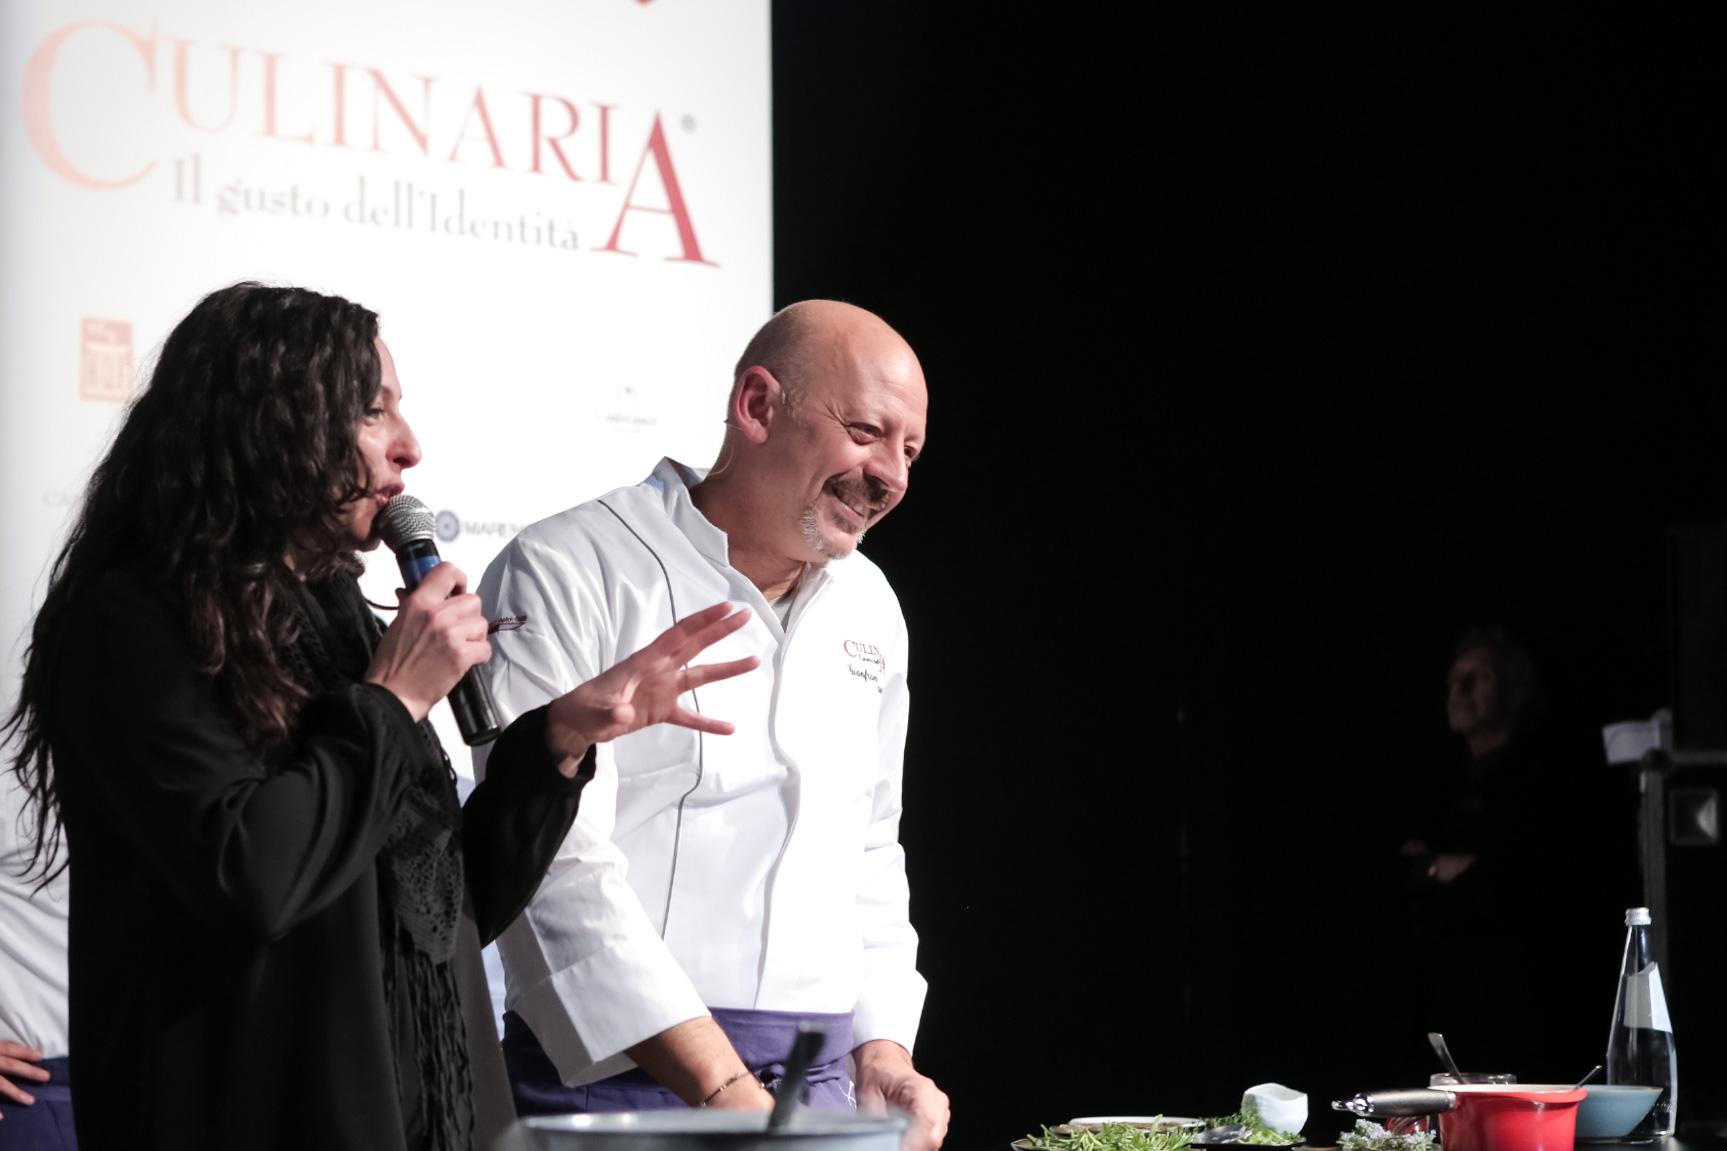 _nf-Culinaria-Pascucci-Fumelli